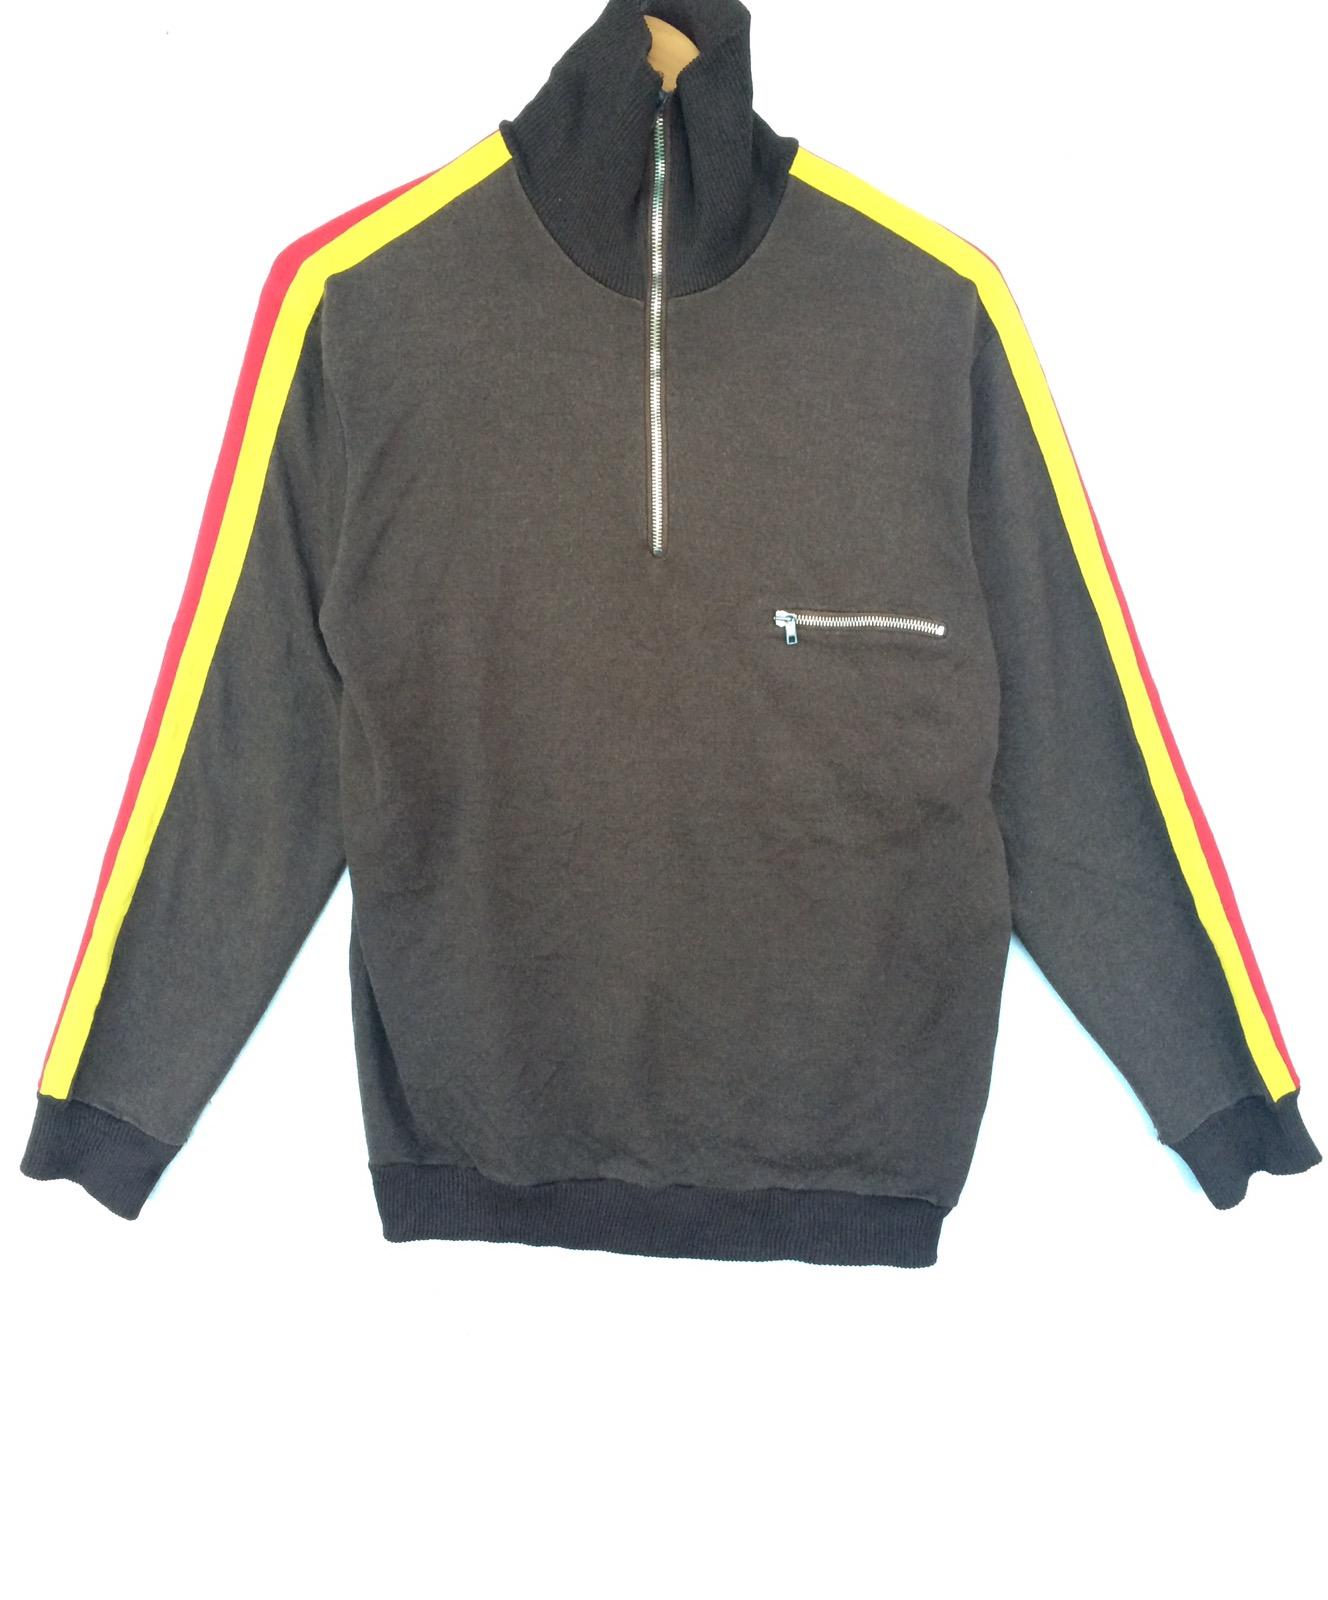 Vintage Army Germany Bundeswehr sweater zipper sweatshirt very rare ss264